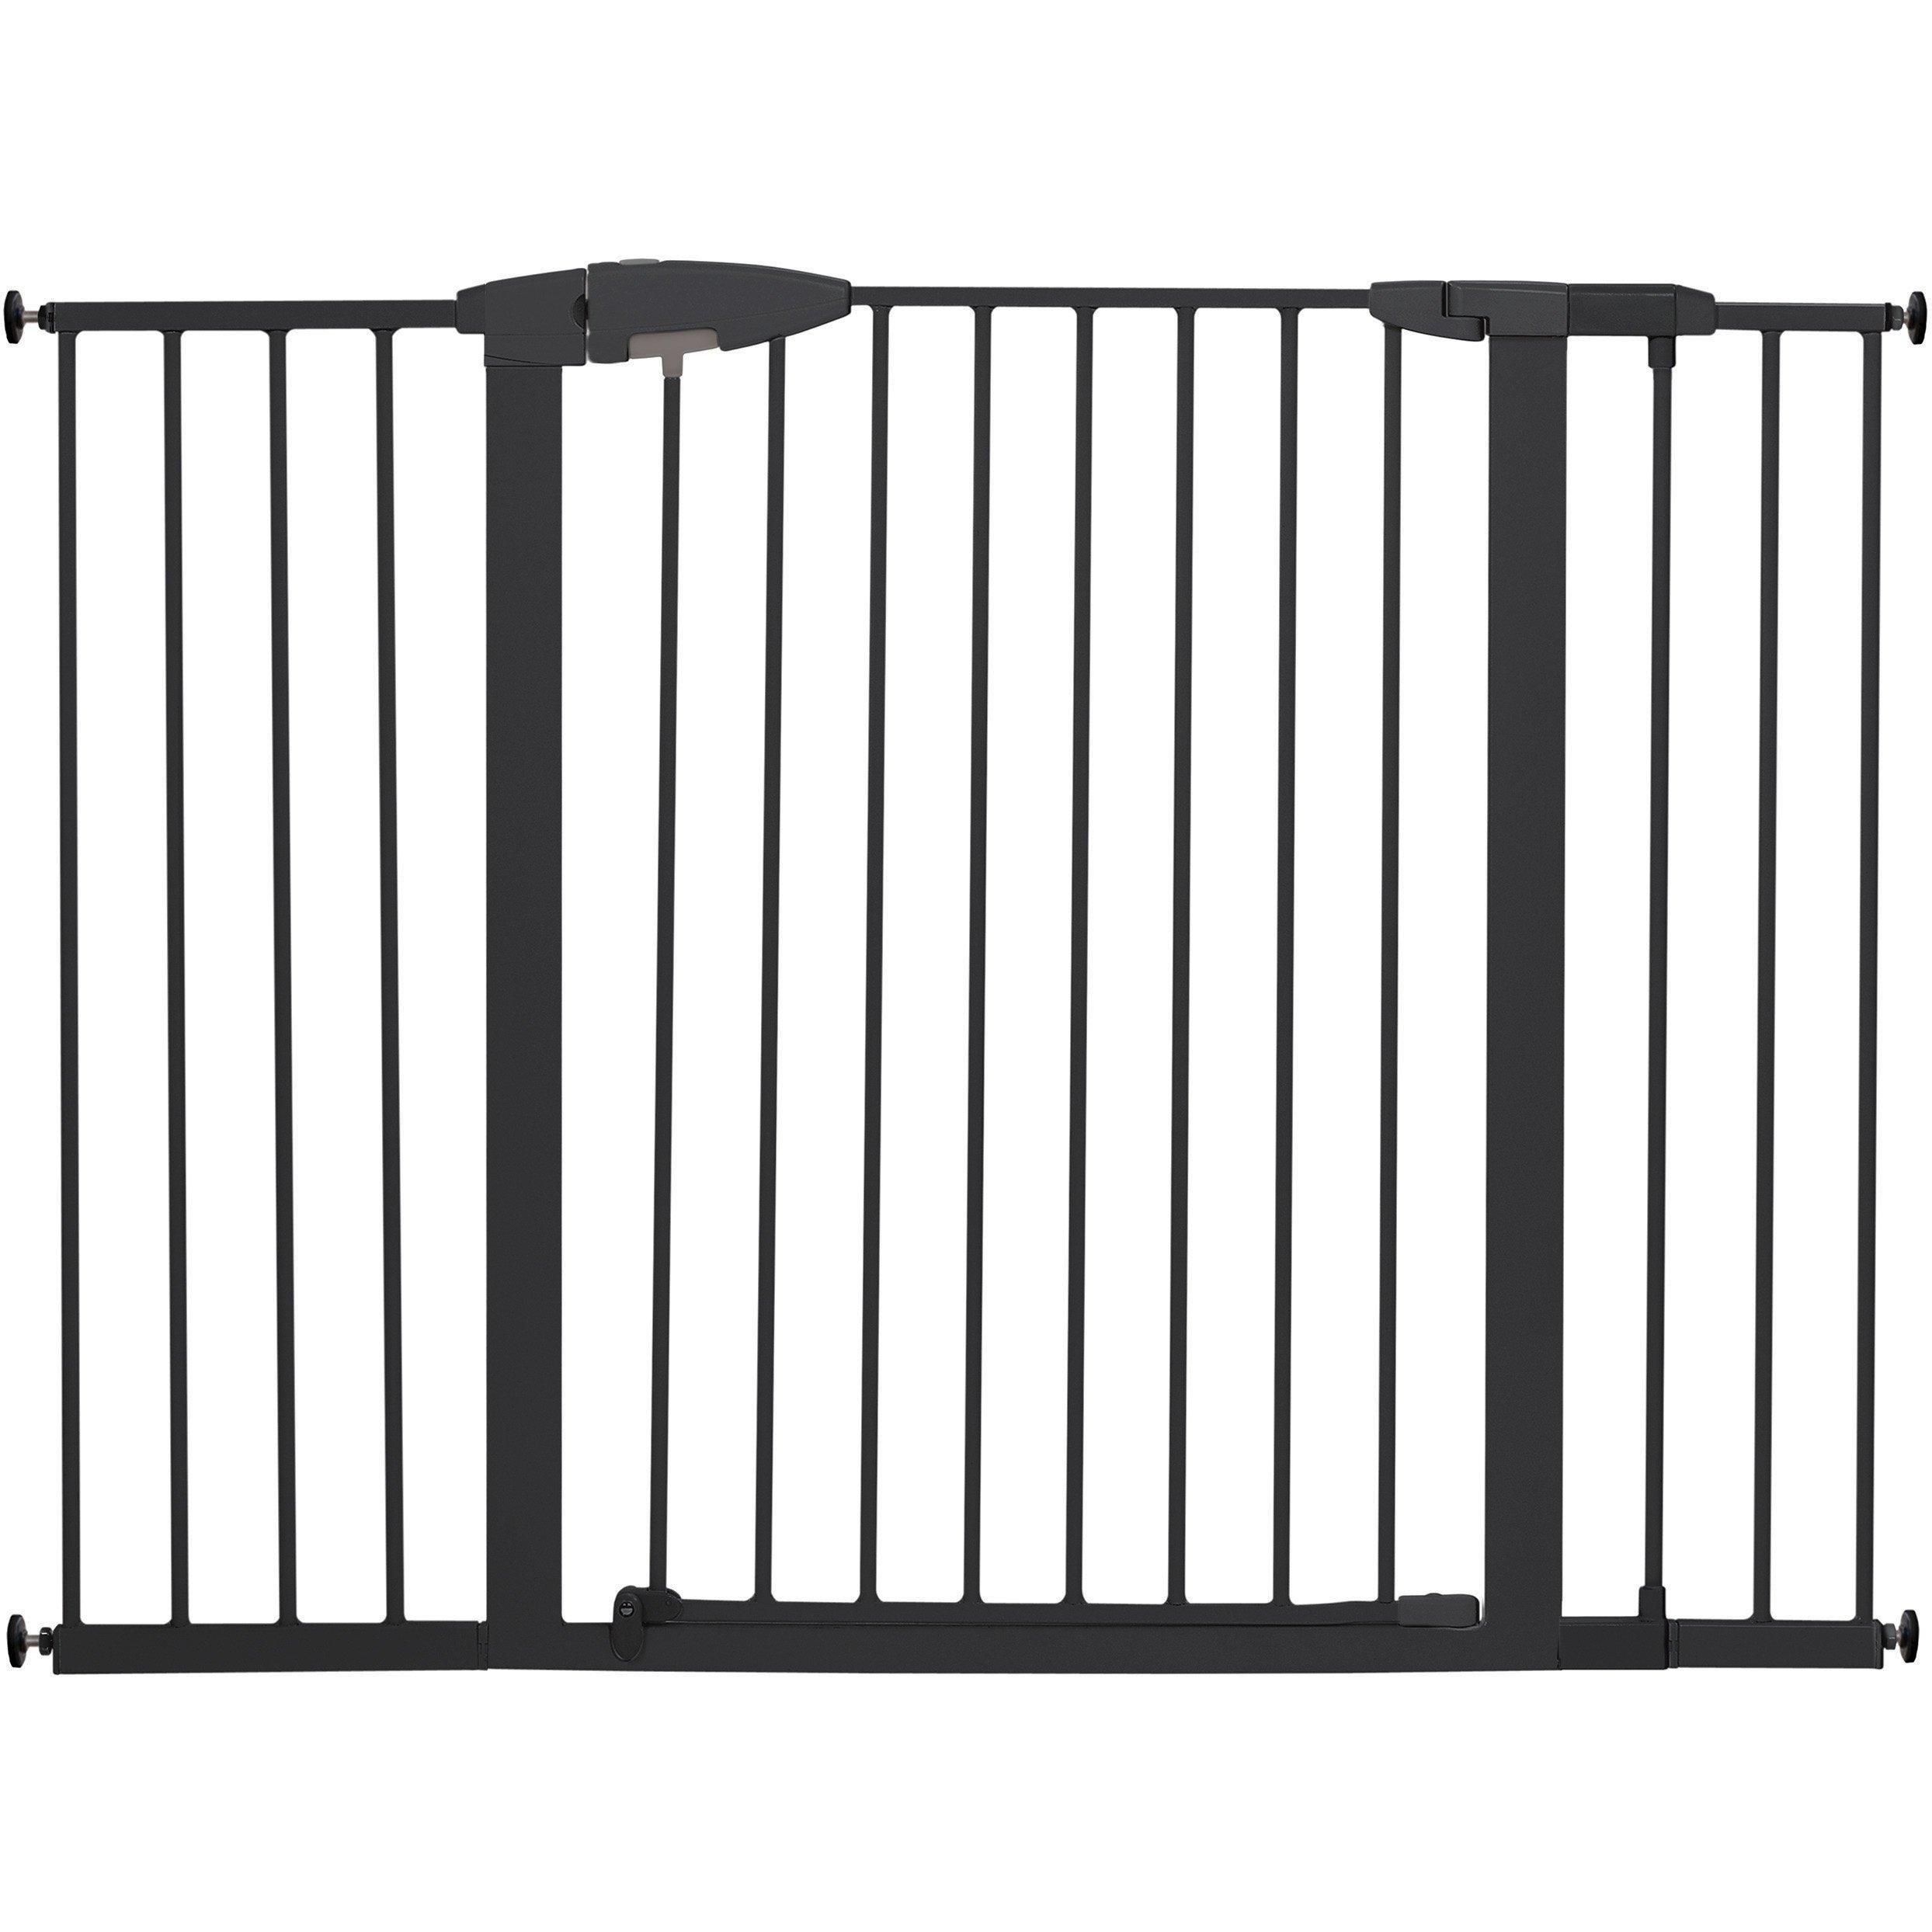 Munchkin Easy Close XL Metal Baby Gate, 29.5'' - 51.6'' Wide, Black, Model MK0009-111 by Munchkin